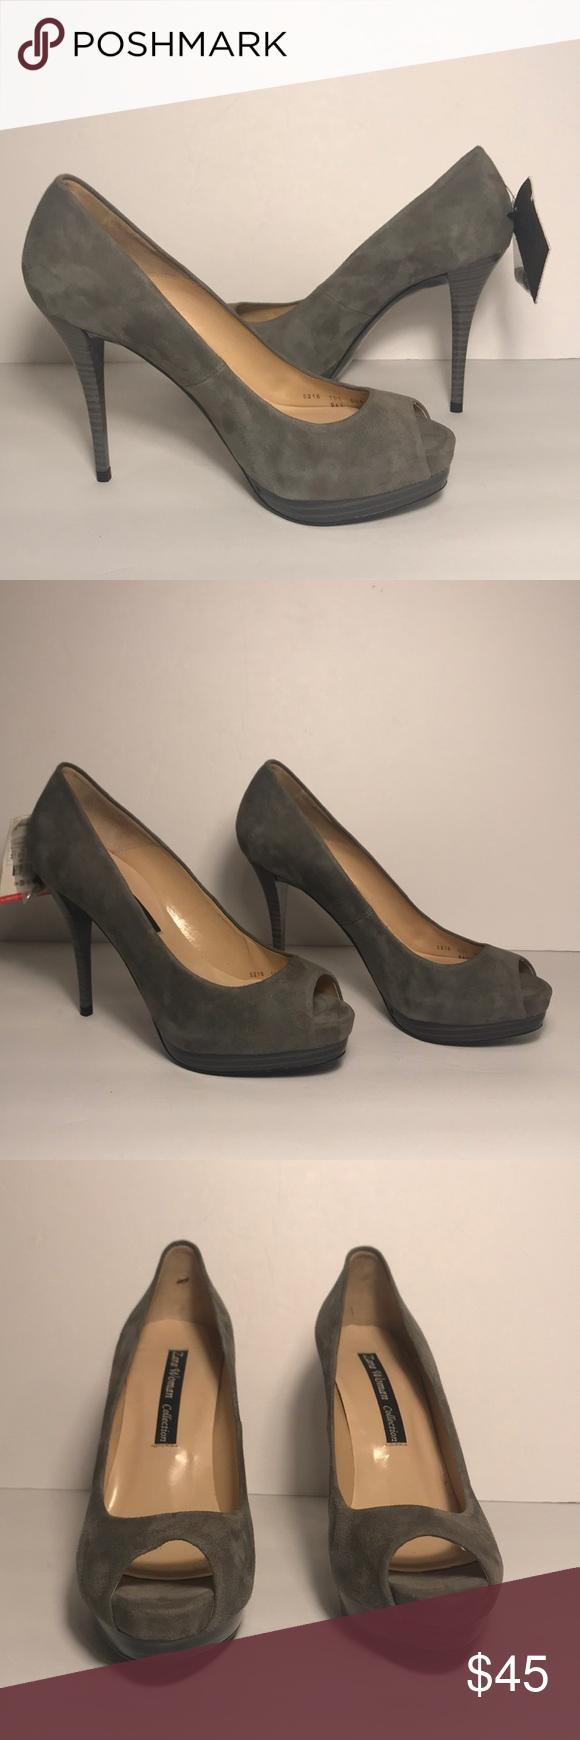 3104026f710 ZARA Grey Suede Platform Peep Toe Heels Gorgeous grey suede open toe  platform pumps.